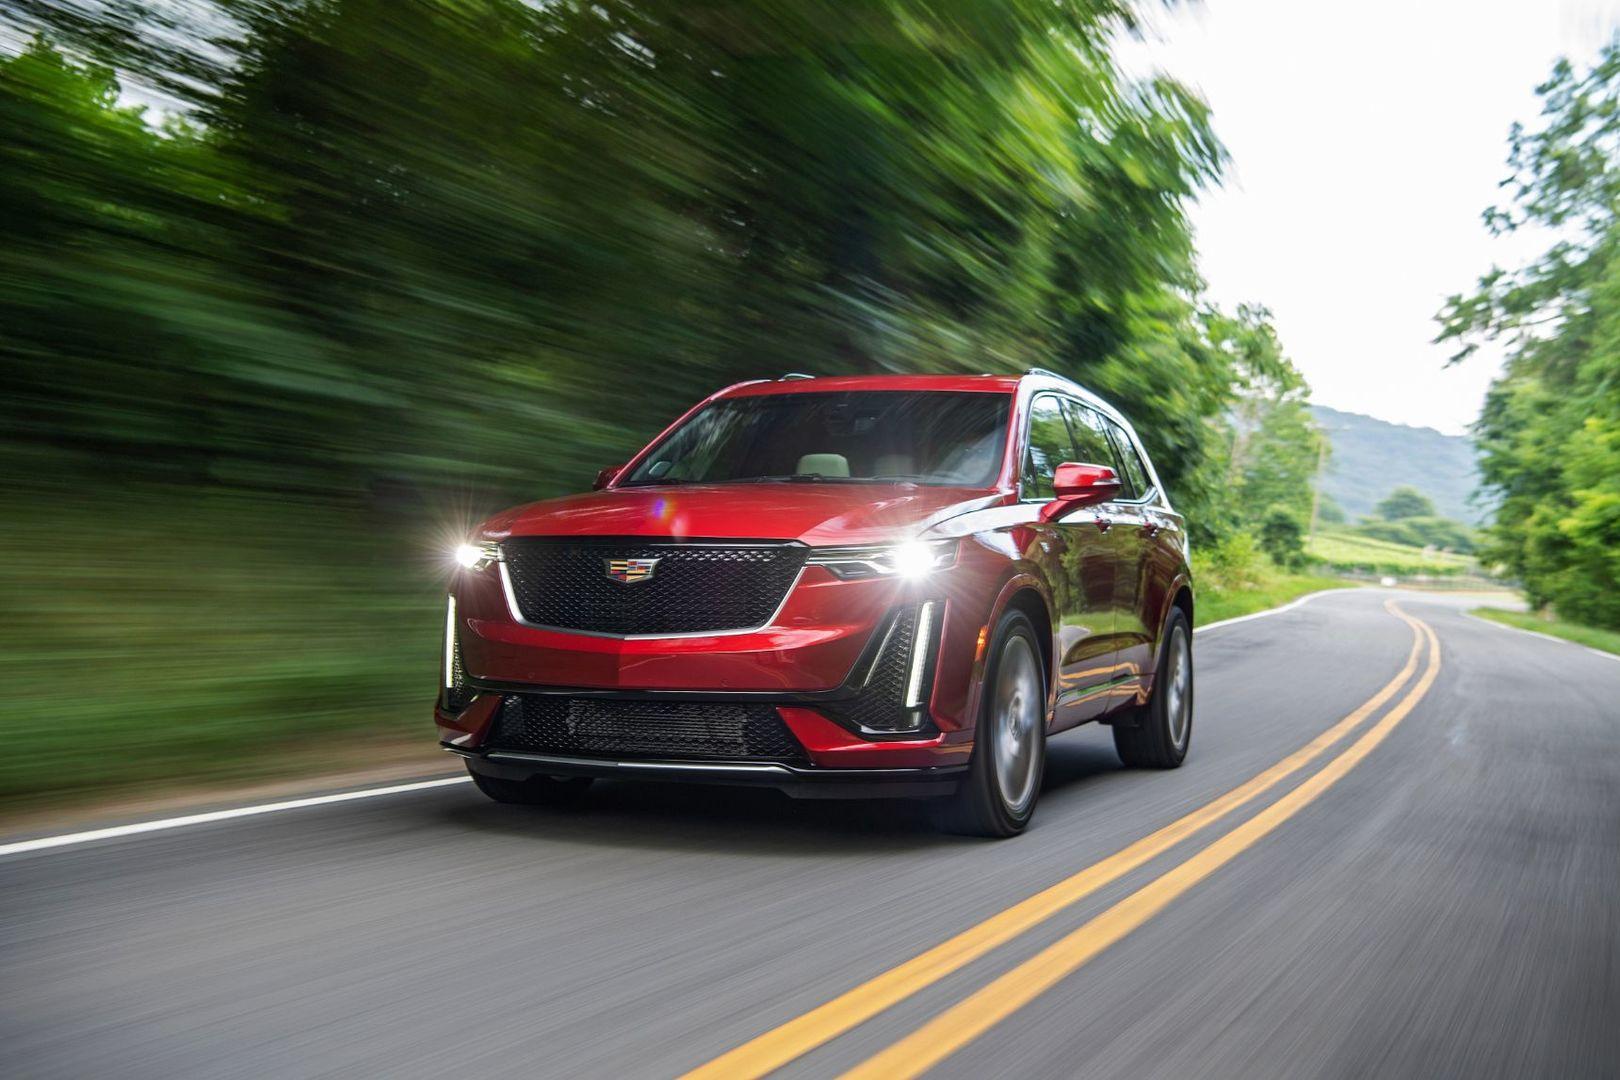 Cadillac объявил старт приема заказов на новый кроссовер XT6